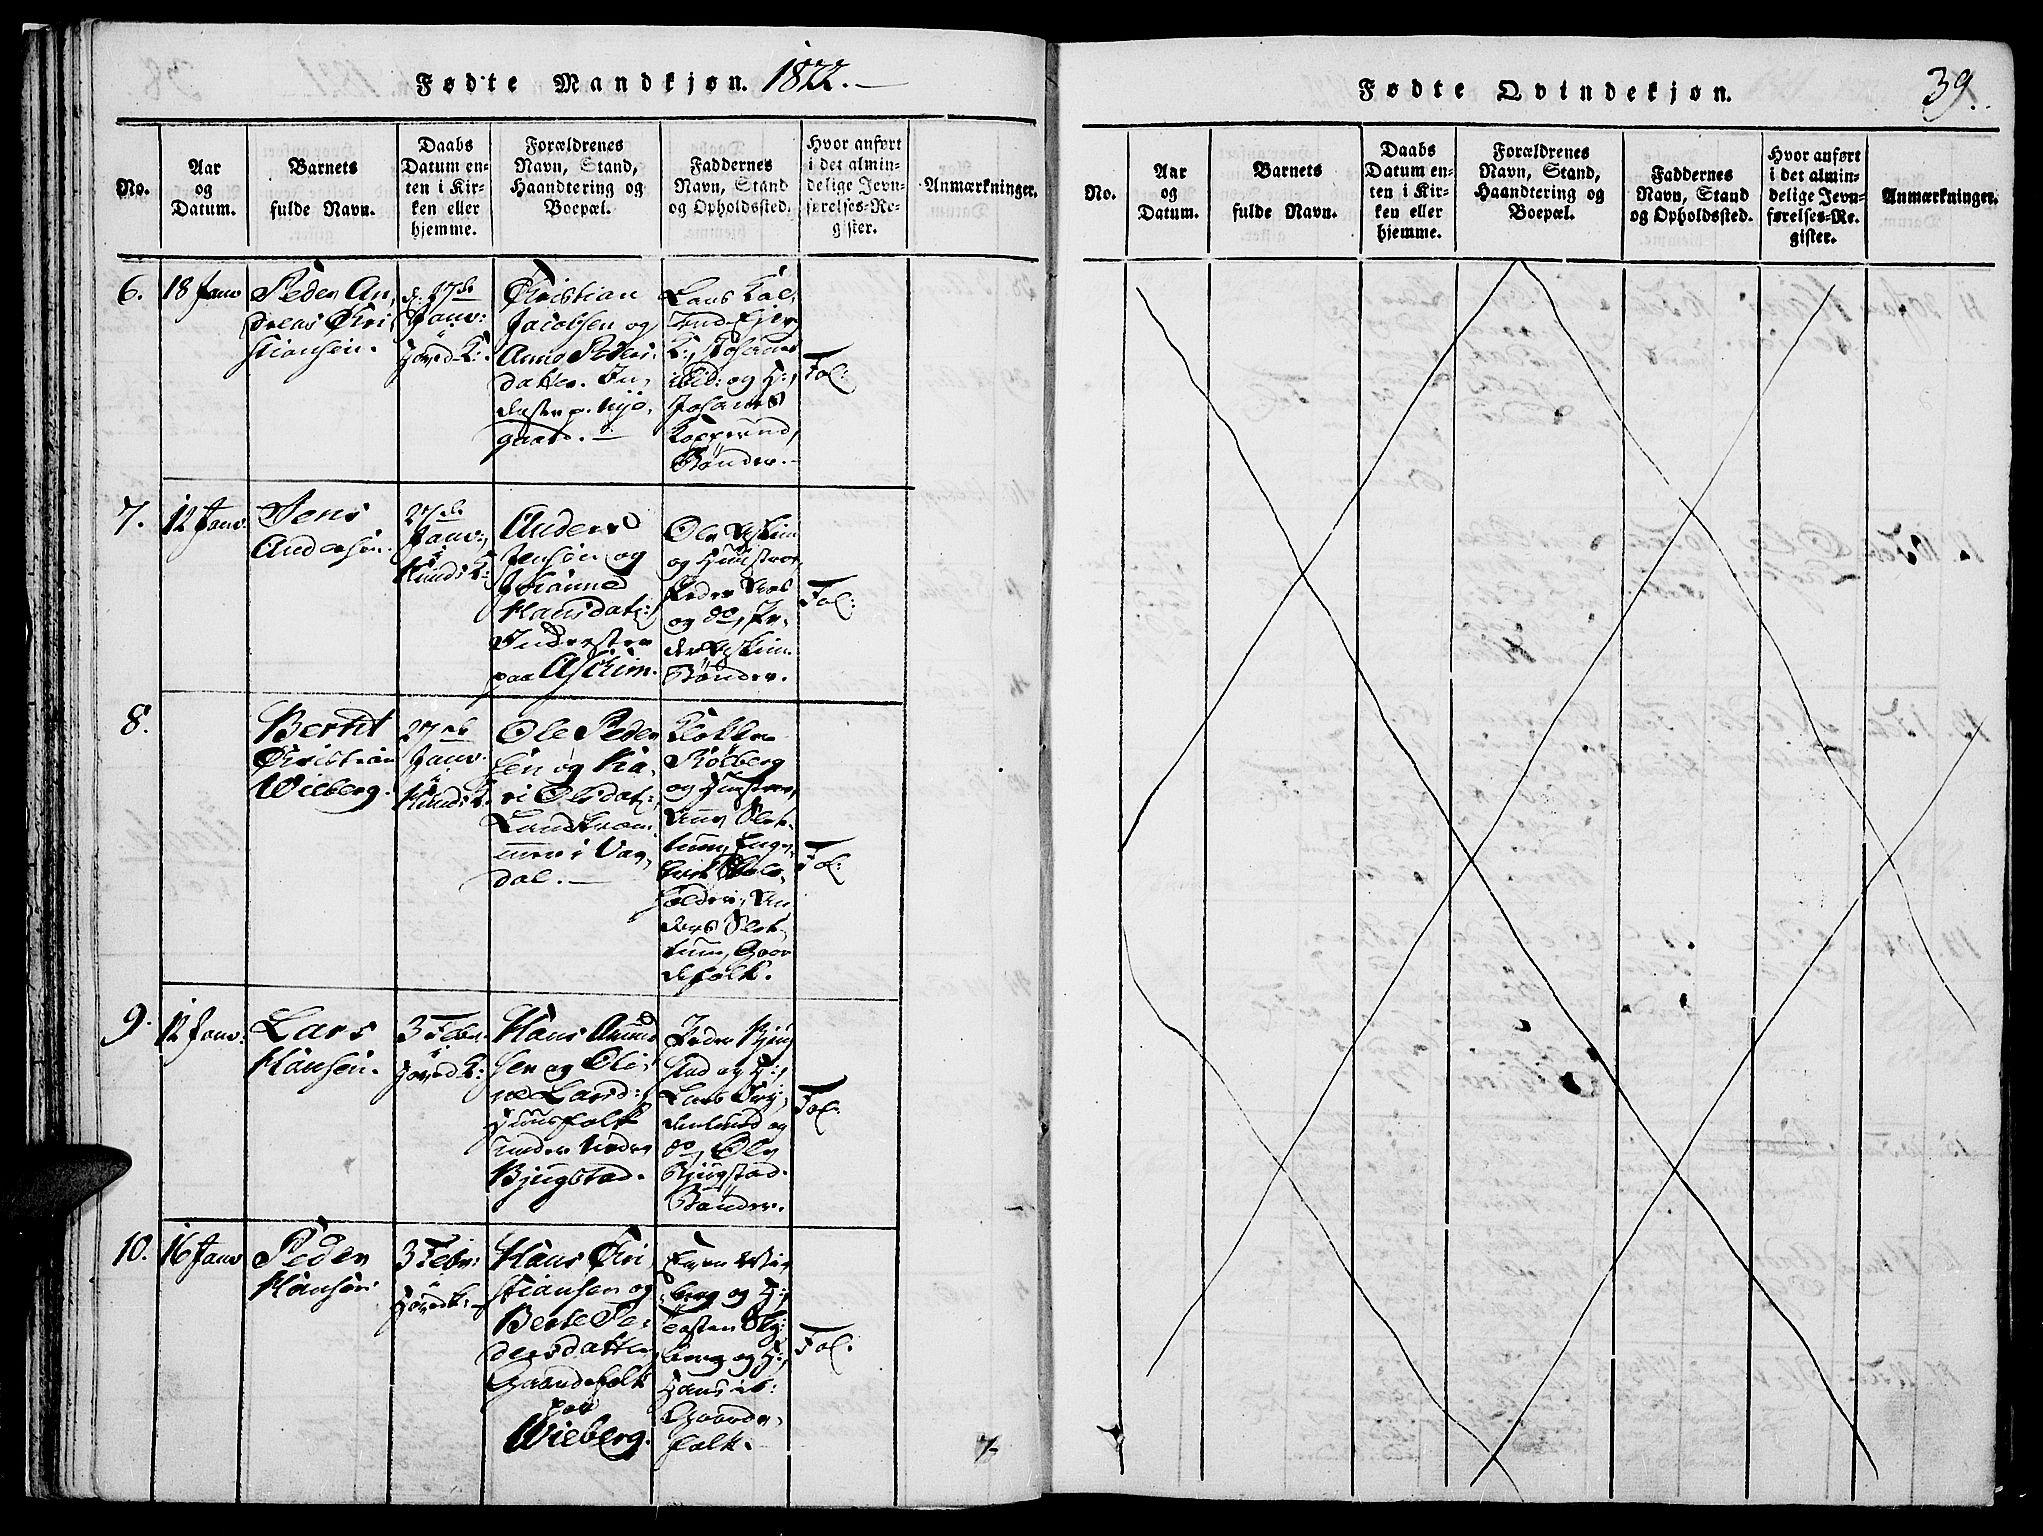 SAH, Vardal prestekontor, H/Ha/Haa/L0004: Ministerialbok nr. 4, 1814-1831, s. 39